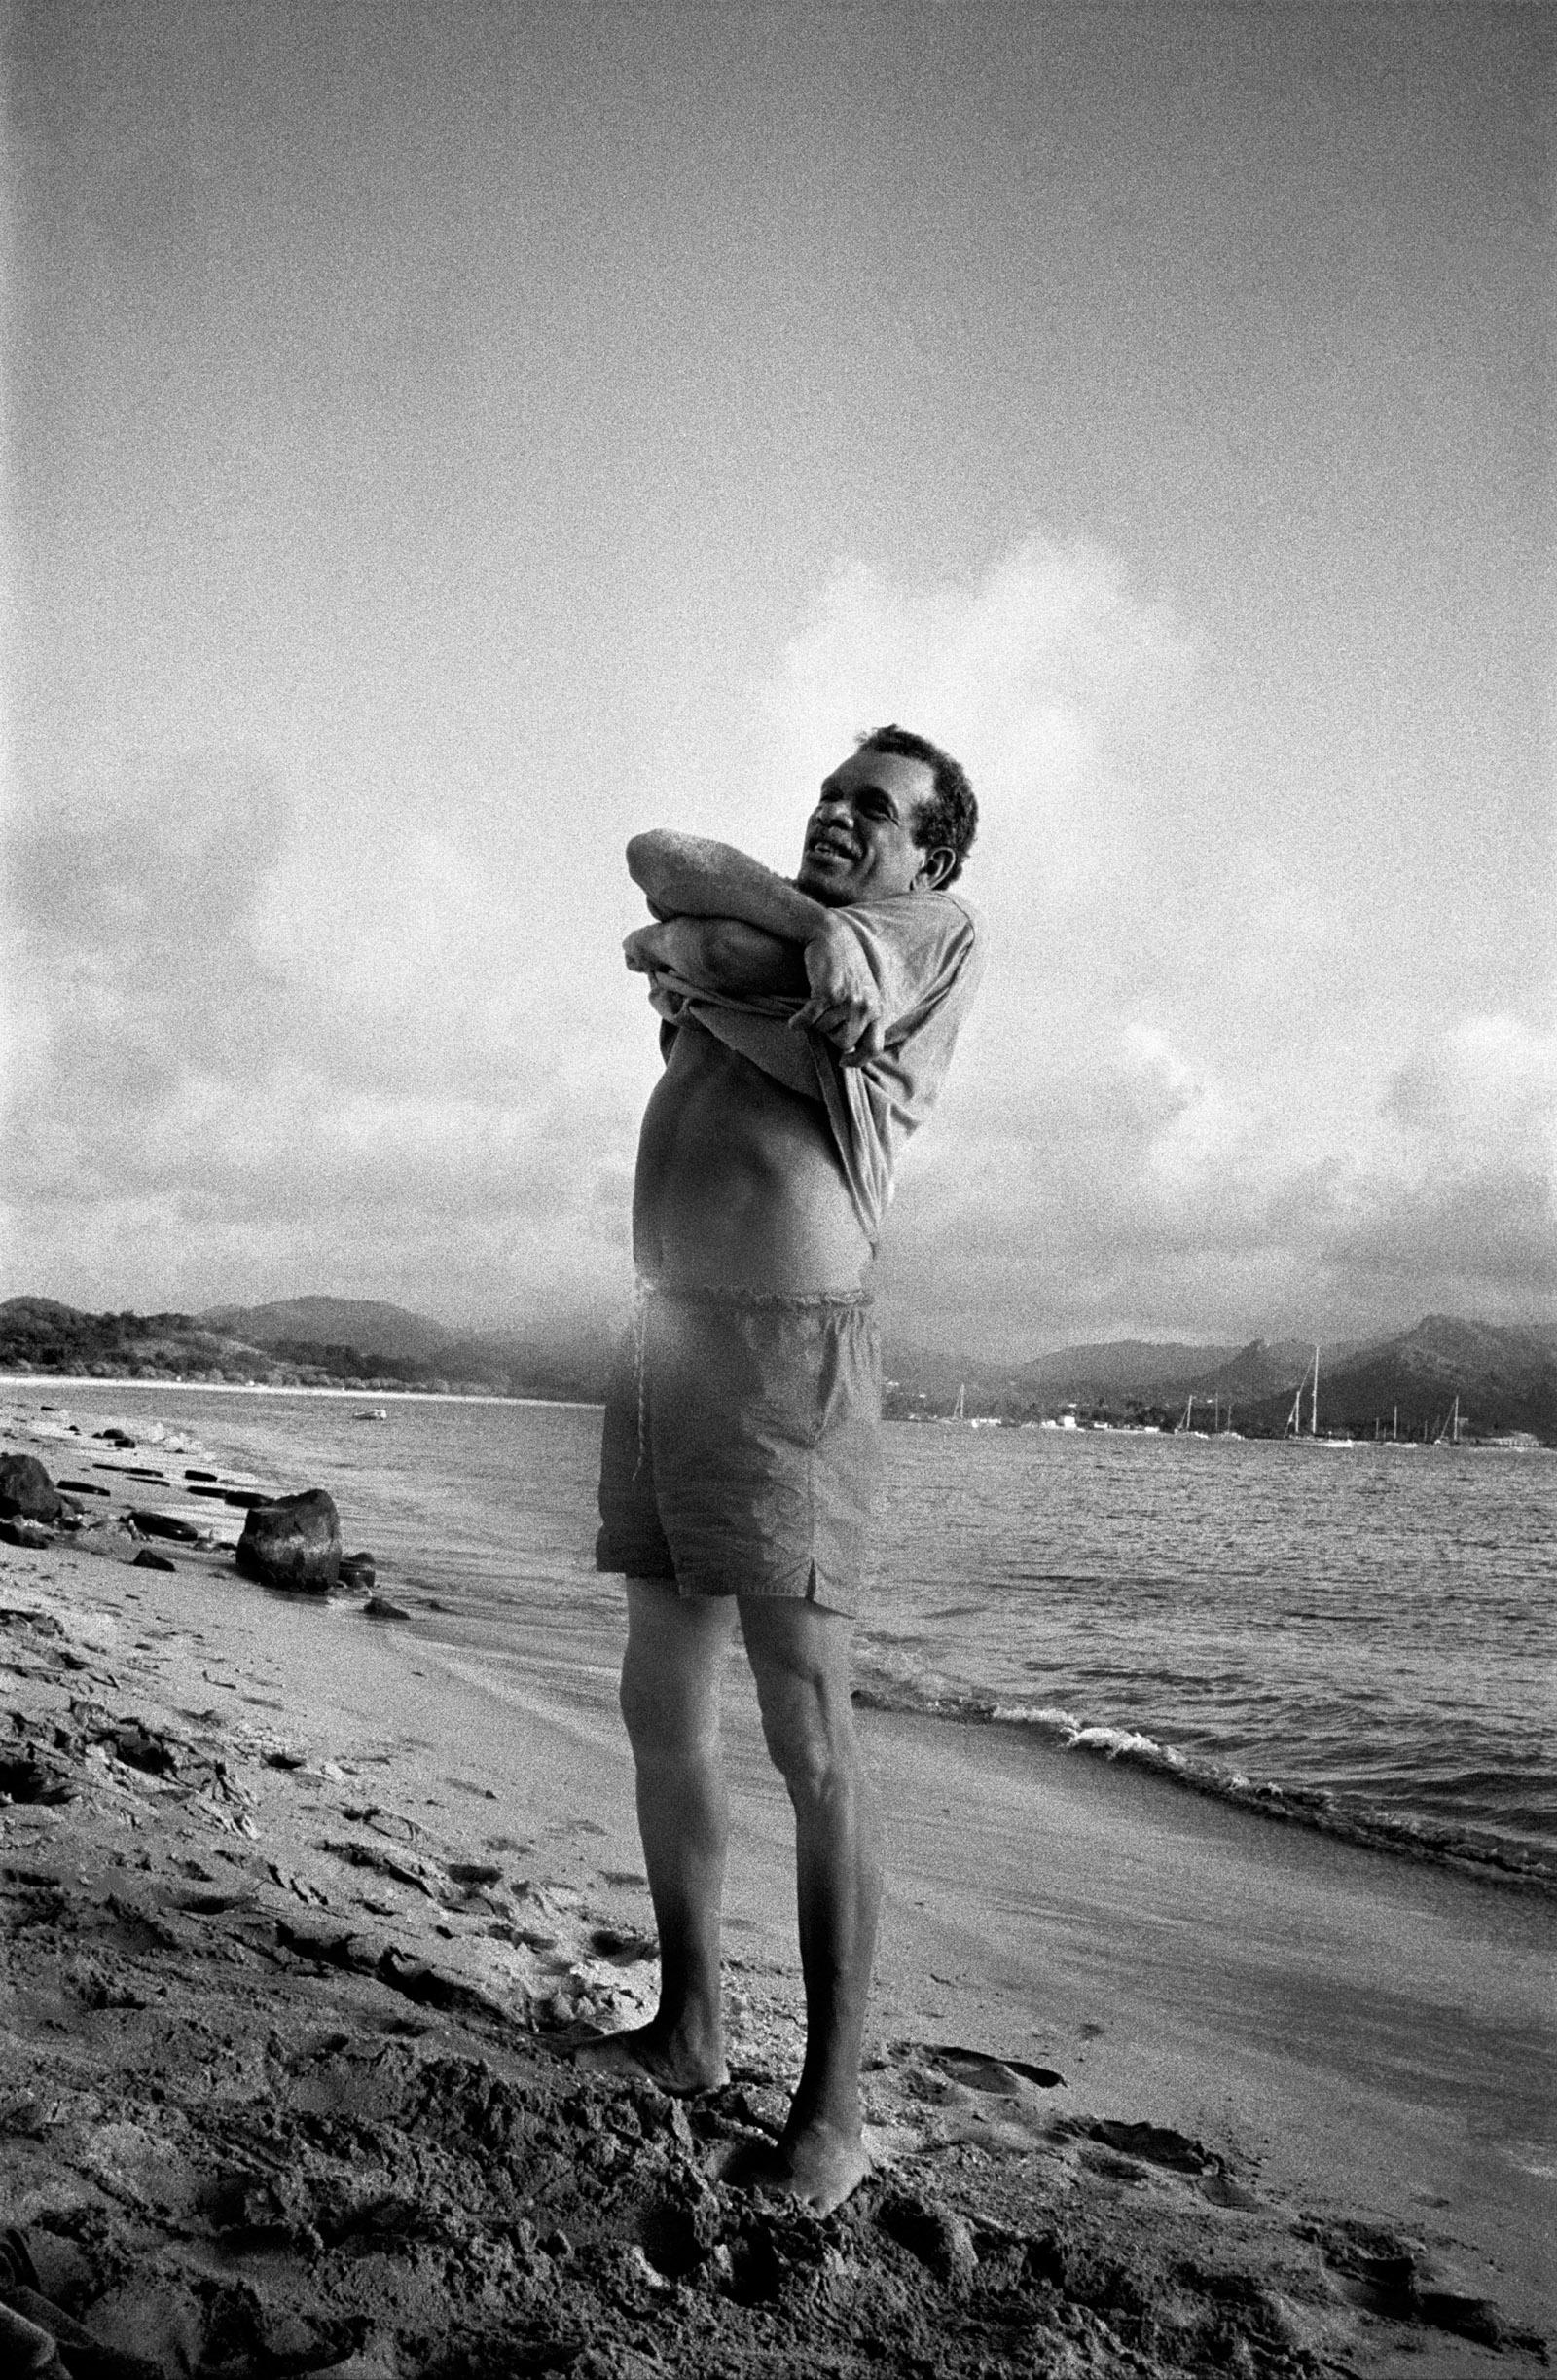 Derek Walcott, St. Lucia, 1994; photograph by Inge Morath